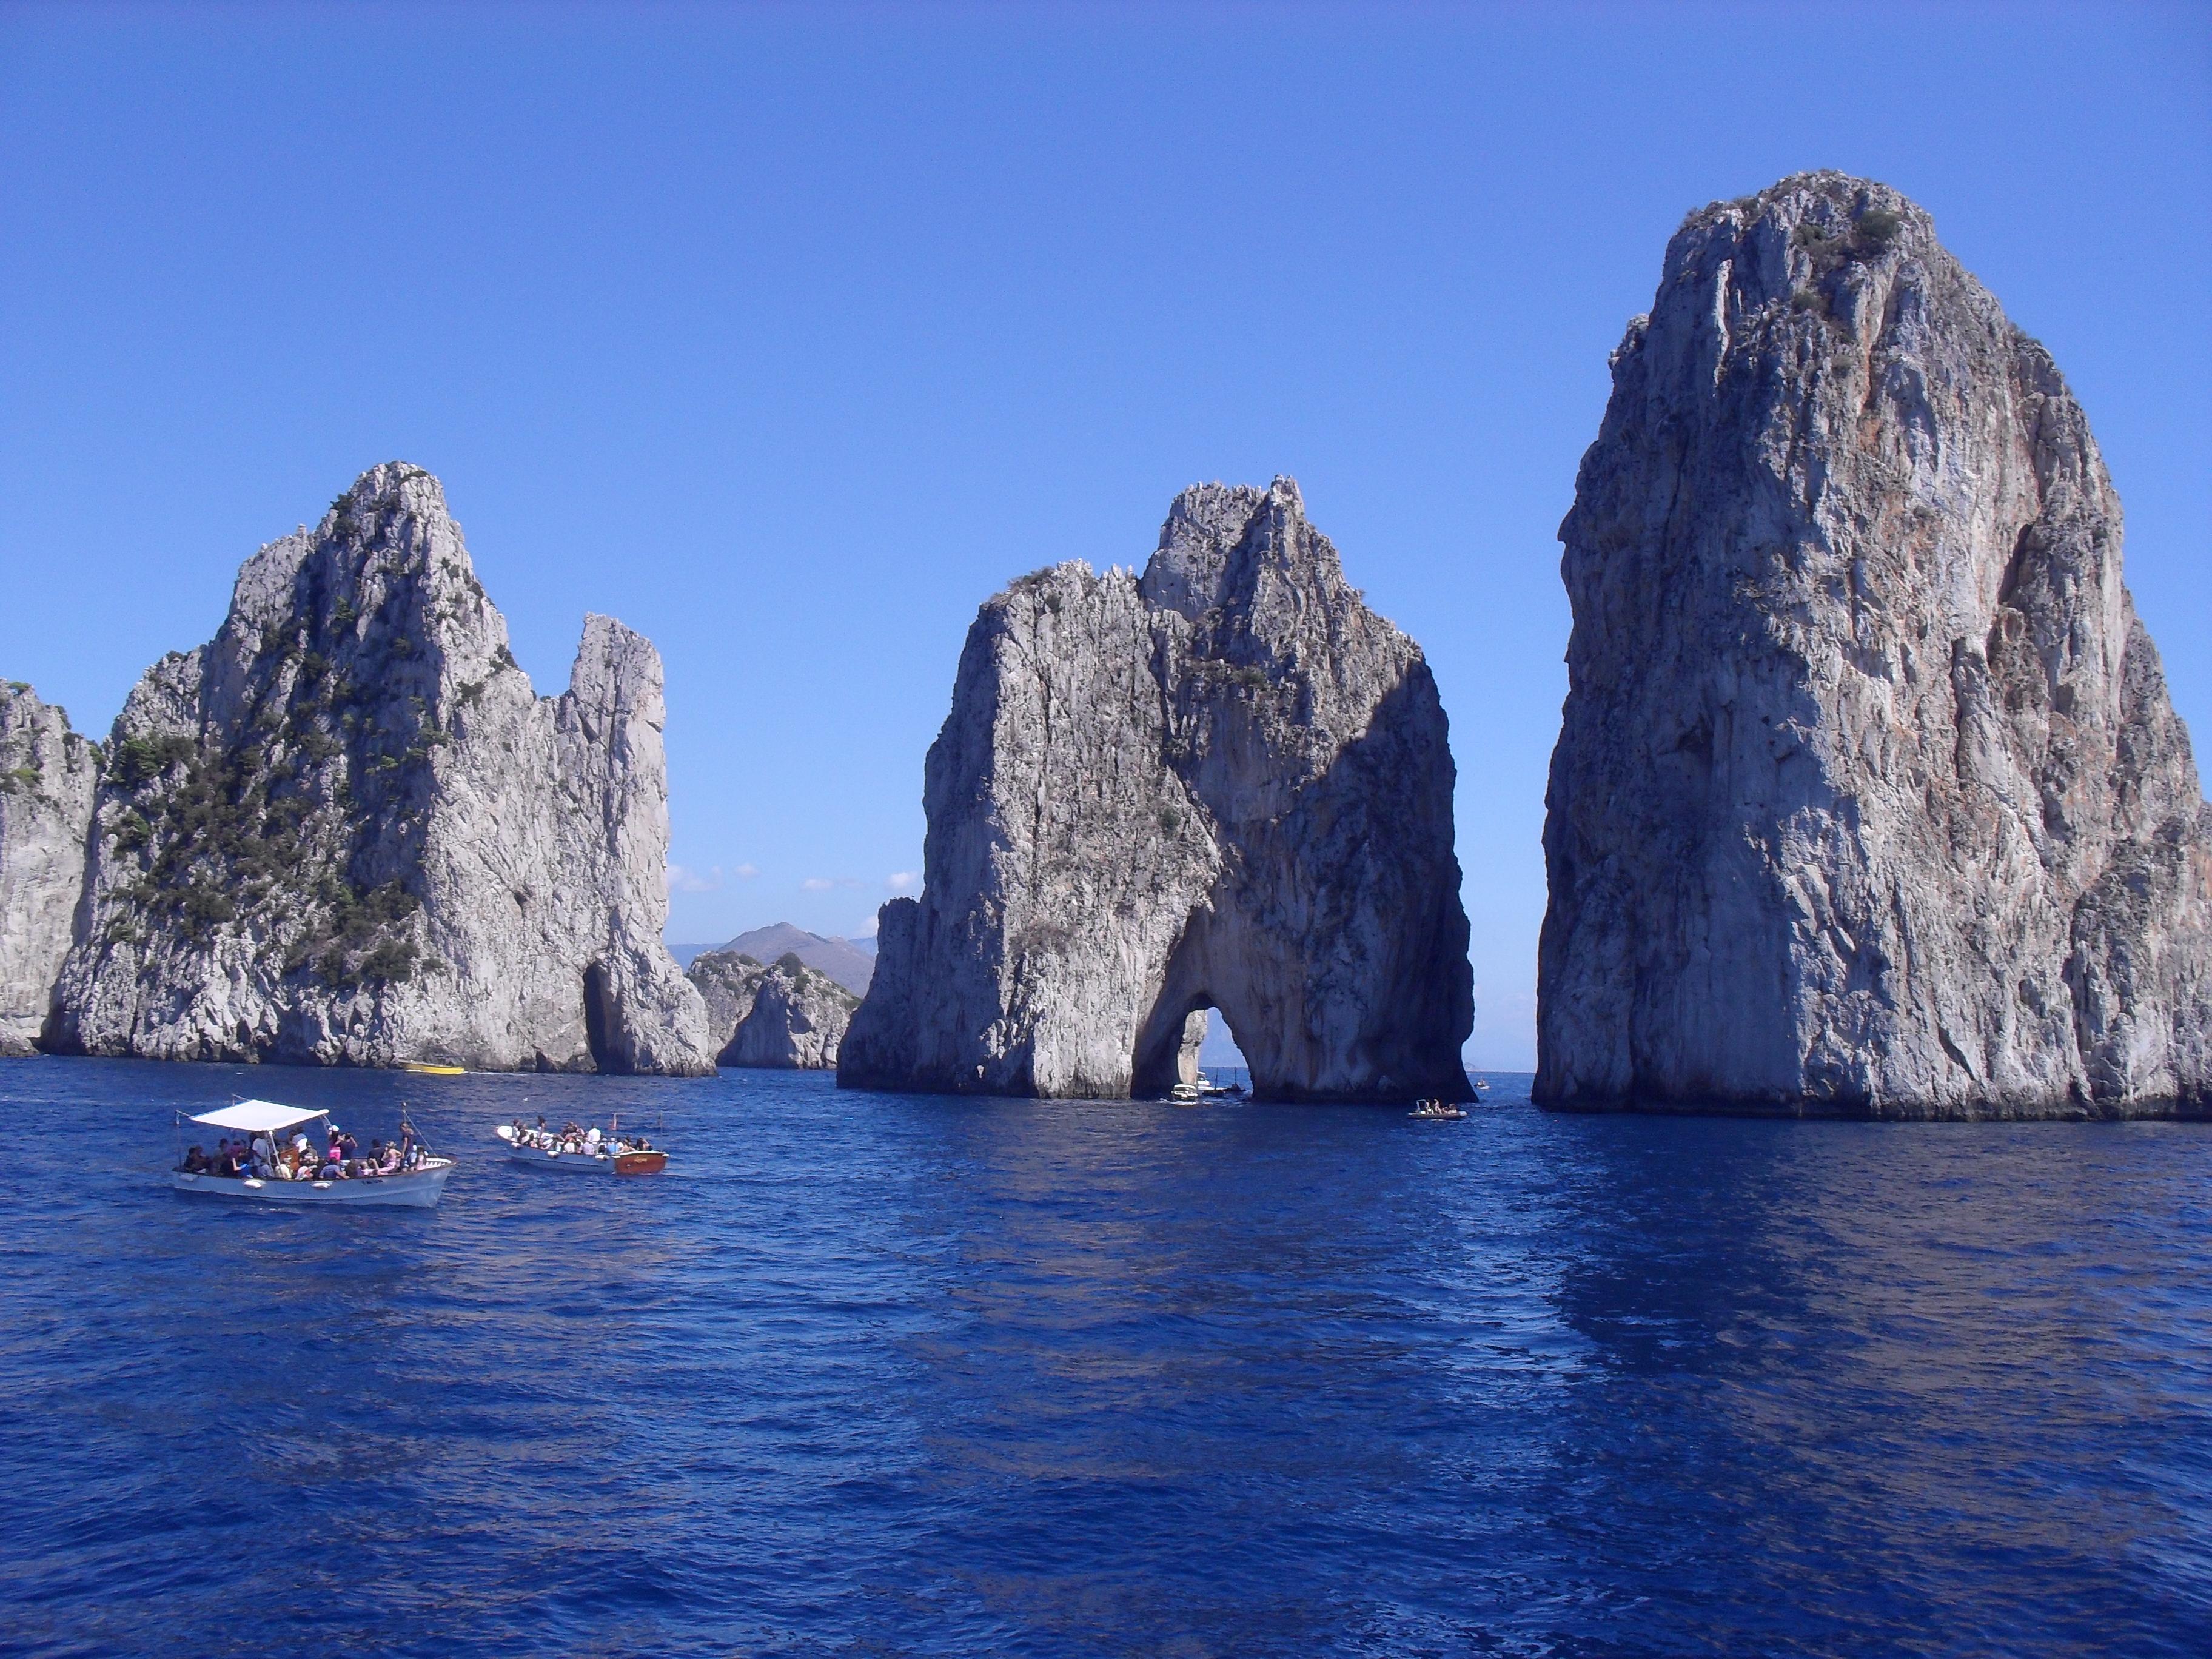 File:Capri, Italia.jpg - Wikimedia Commons